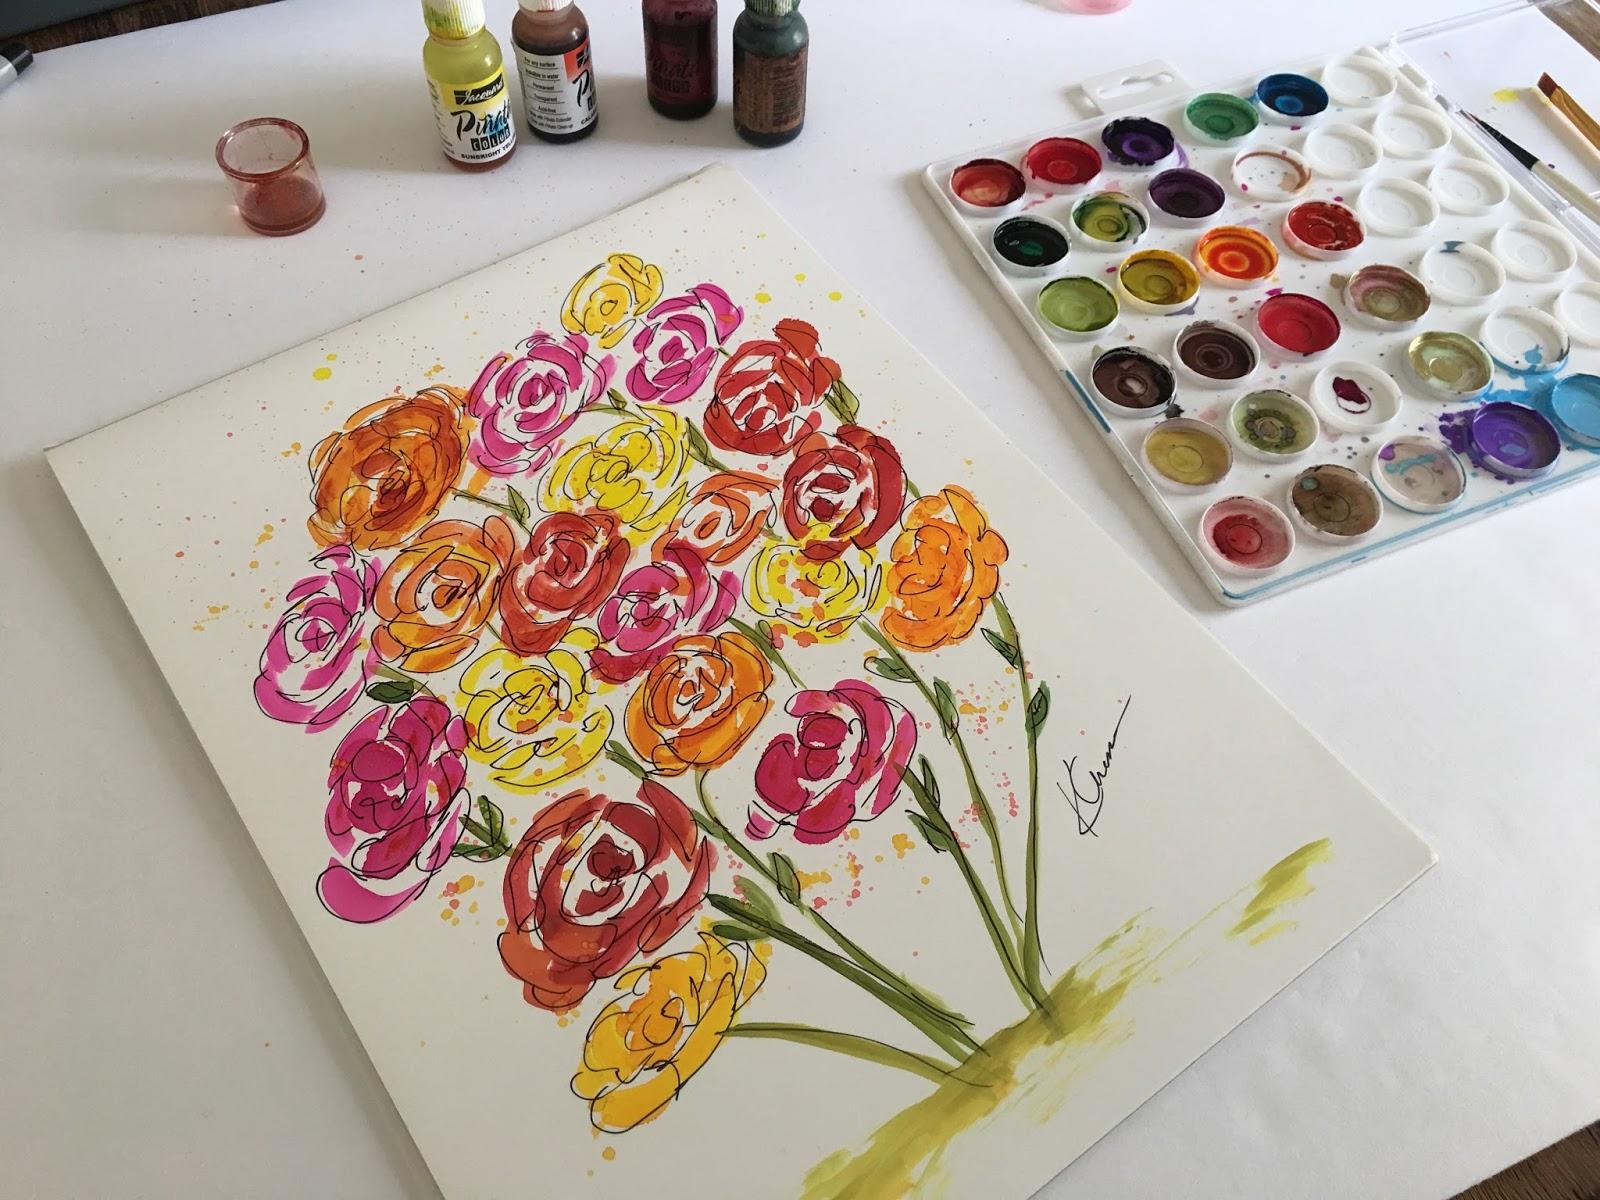 kellie chasse fine art alcohol ink flower illustration painting